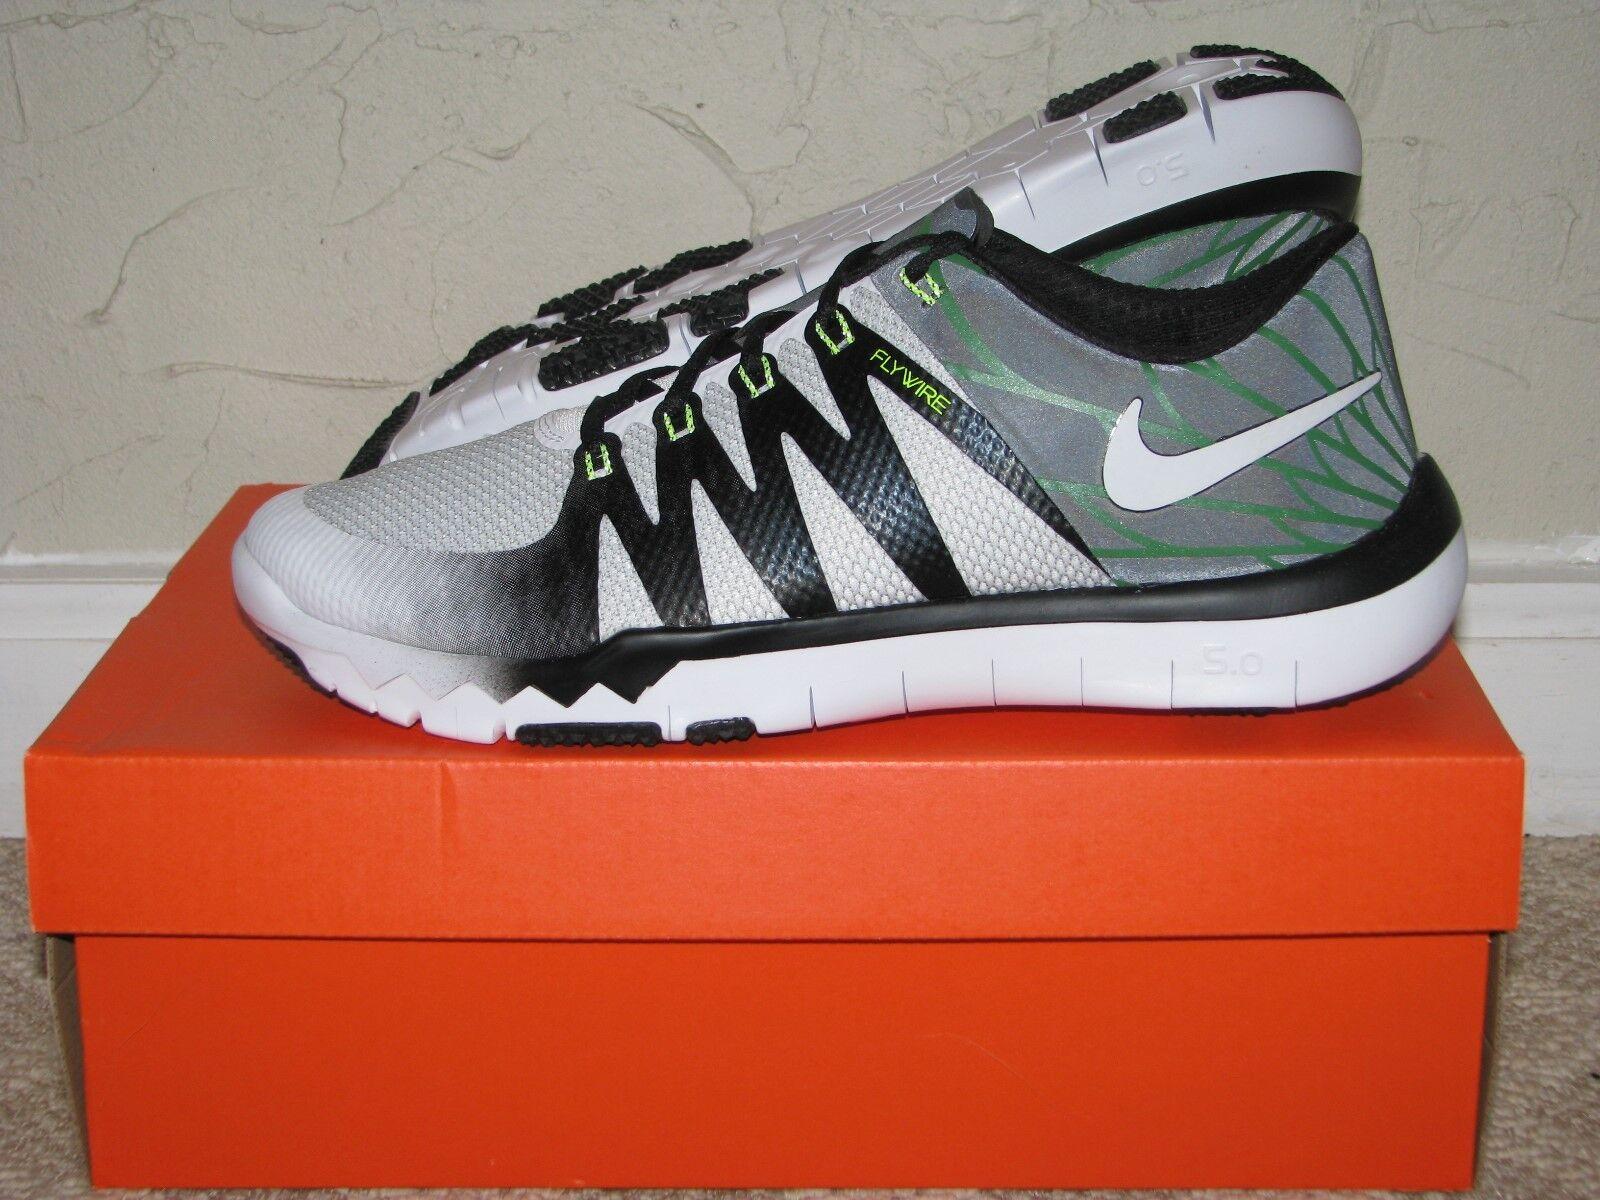 Nike V6 Free Trainer 5.0 V6 Nike AMP Oregon Ducks White Mens Size 10 DS NEW! 723939-100 3de9cf